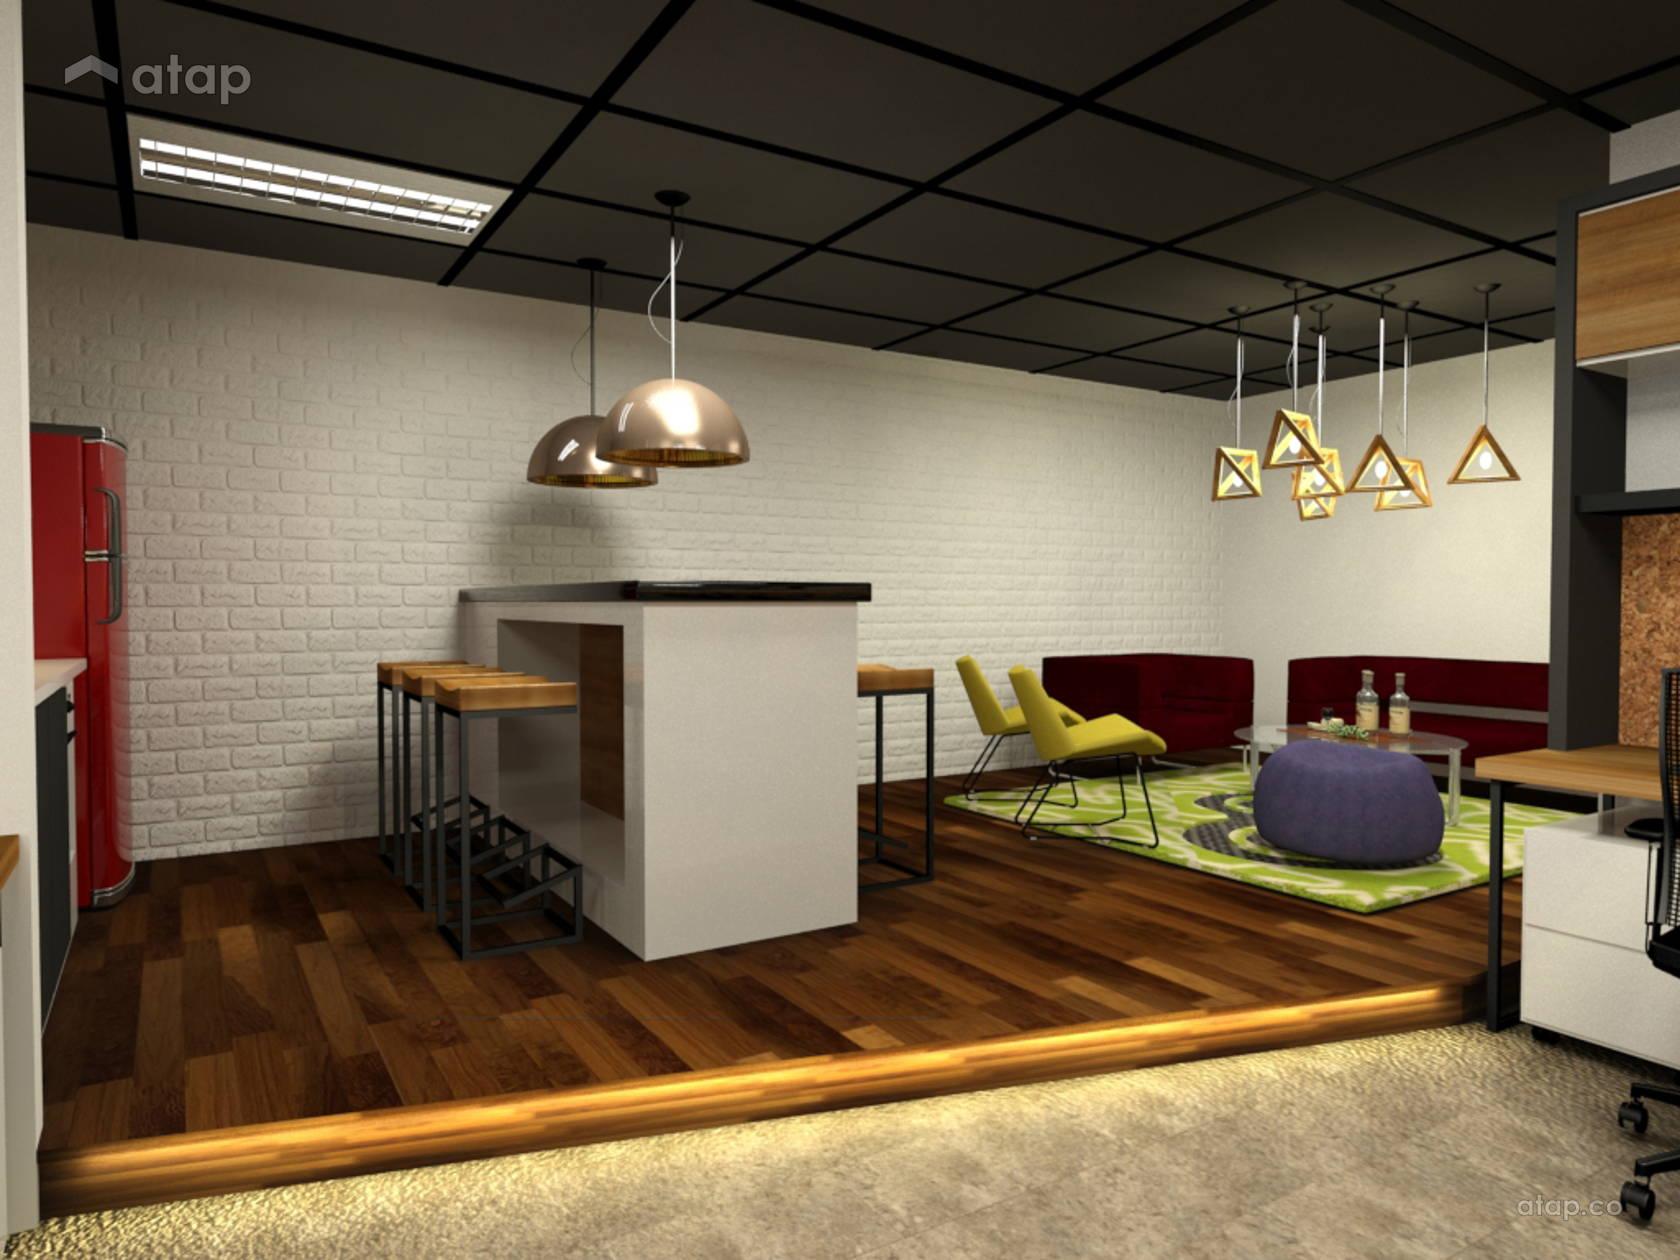 Q Sentral interior design renovation ideas, photos and price in Malaysia |  Atap.co